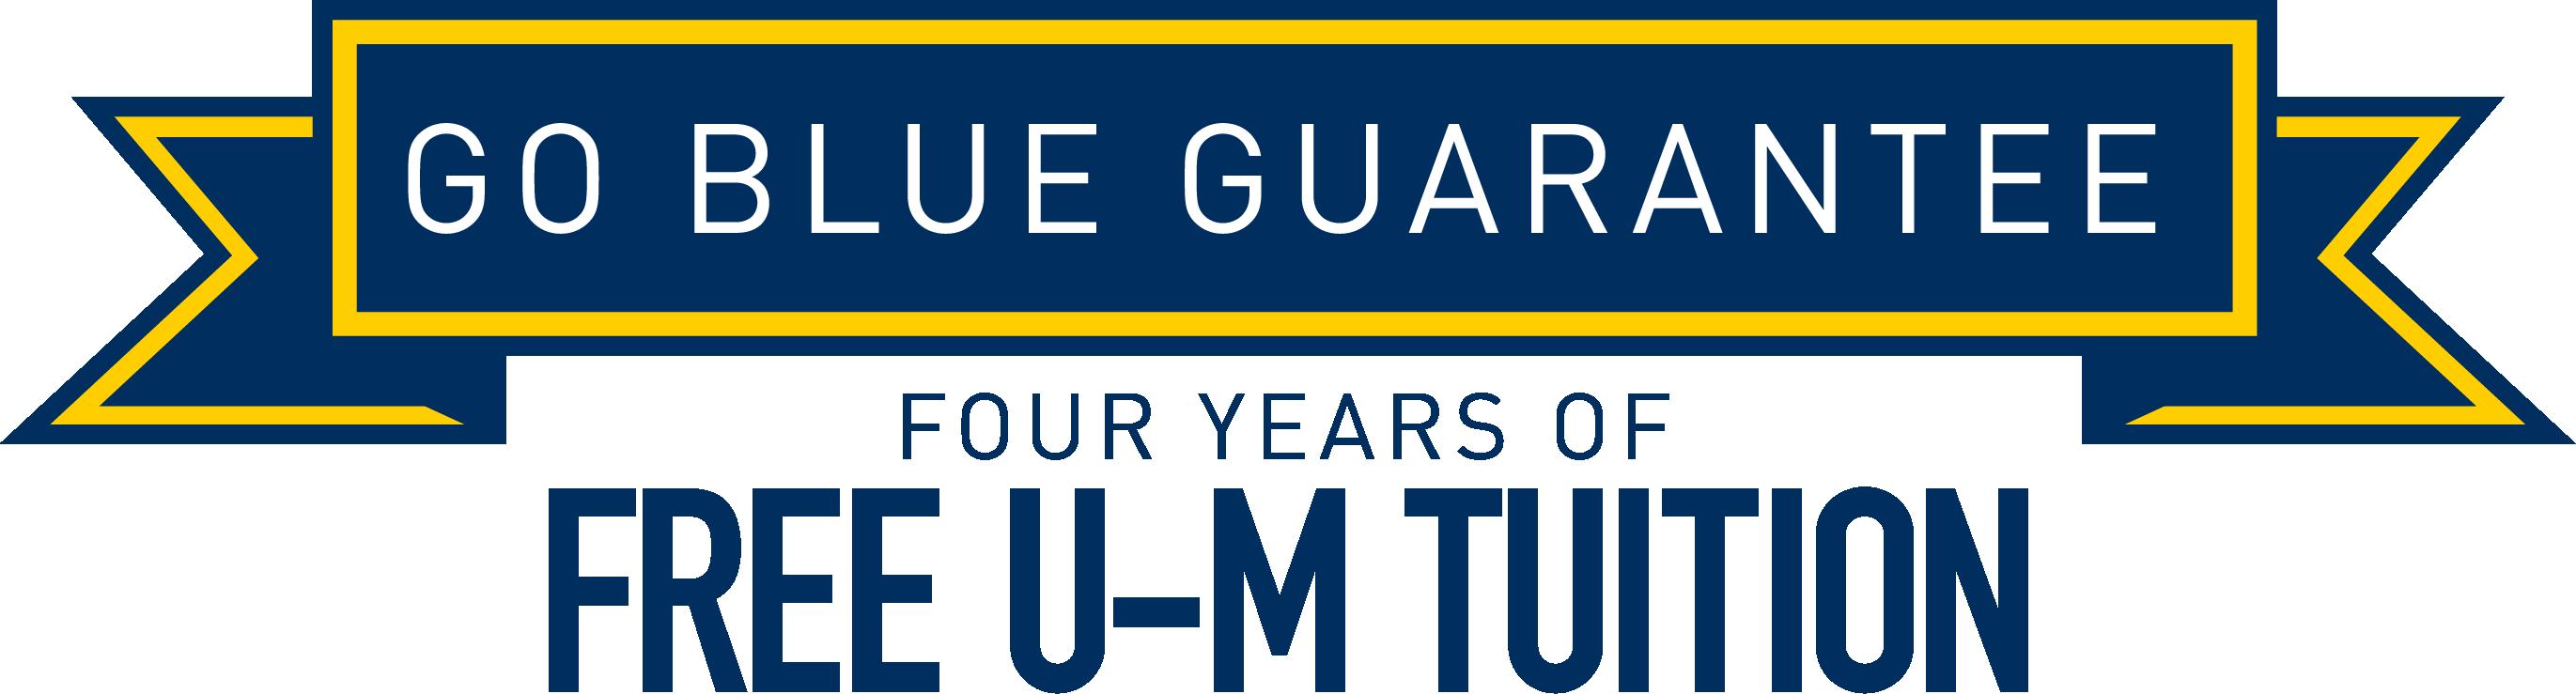 University of michigan football clipart clip art library stock Go Blue Guarantee | University of Michigan clip art library stock